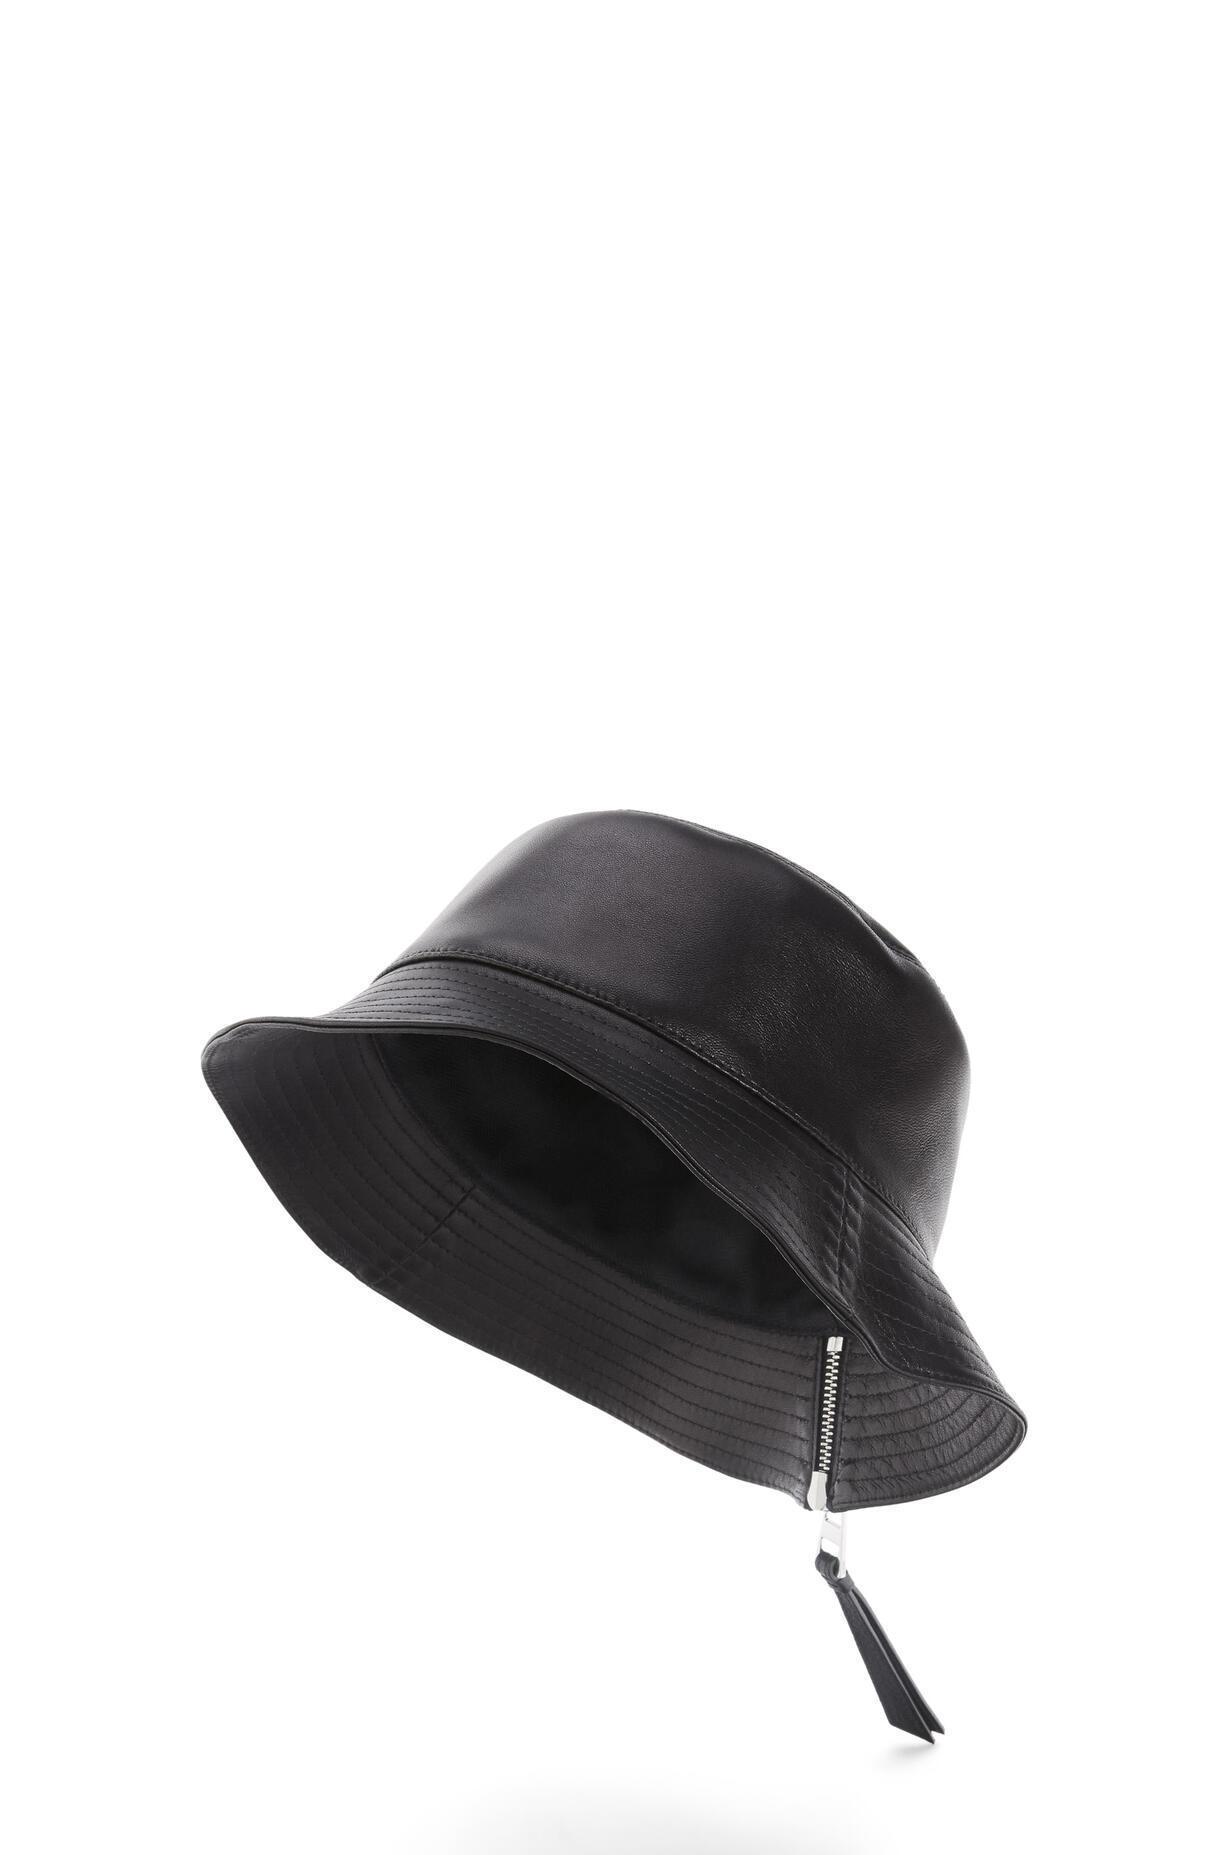 LOEWE LOEWE ☆Fisherman hat in nappa calfskin☆112.10.010